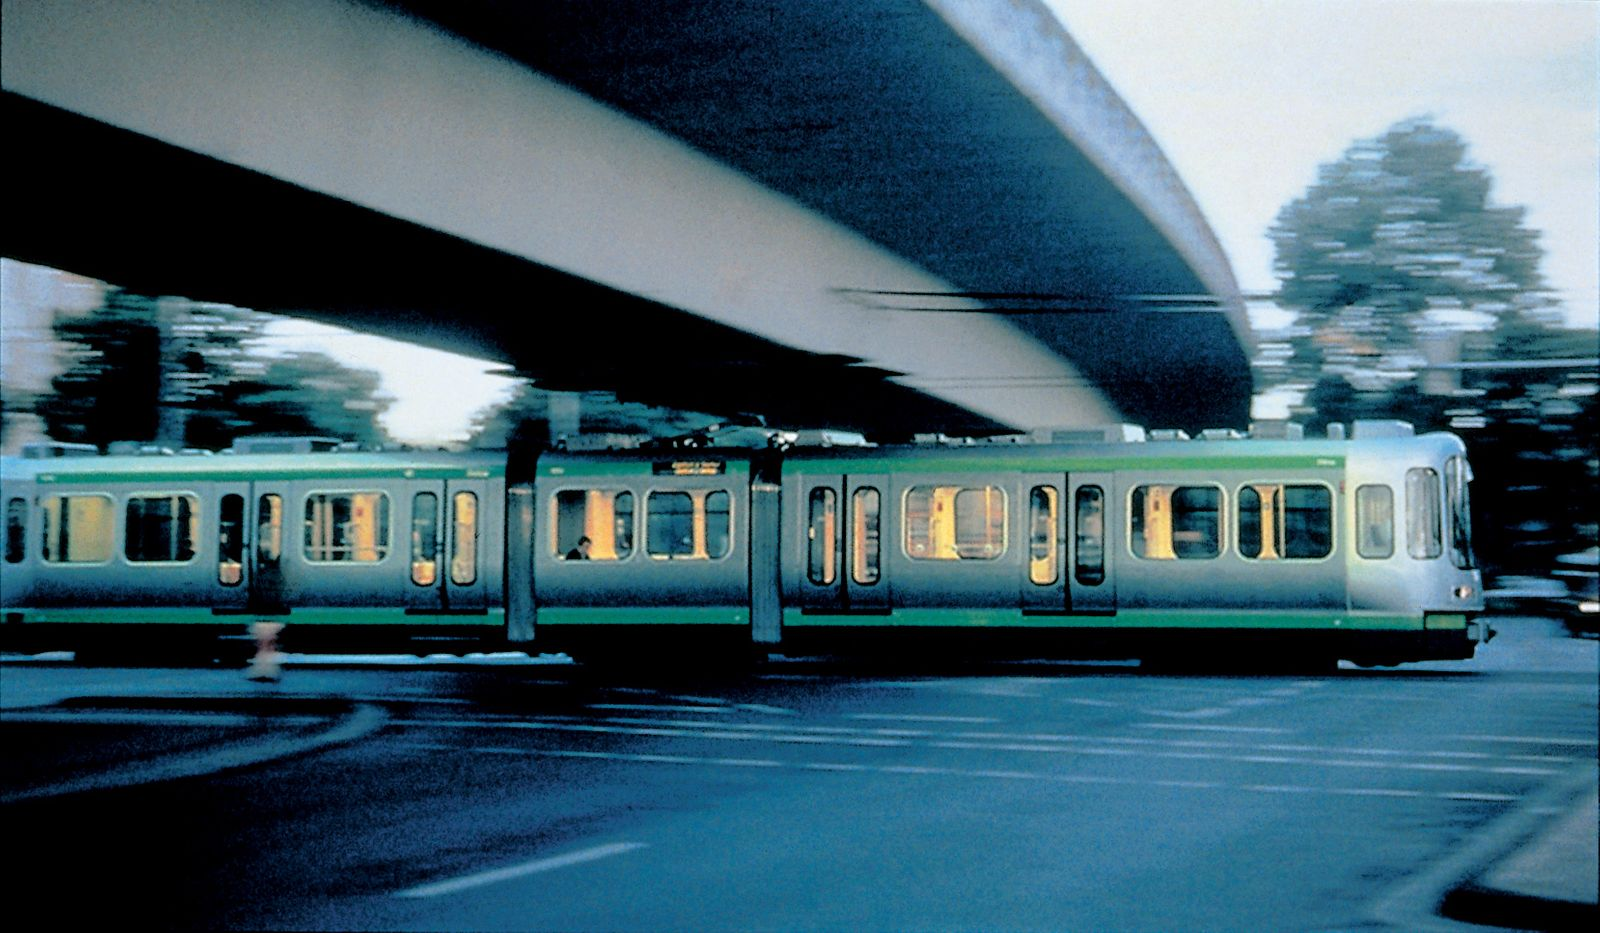 JM-Ustra-1997-Hanover Tram-Under bridge